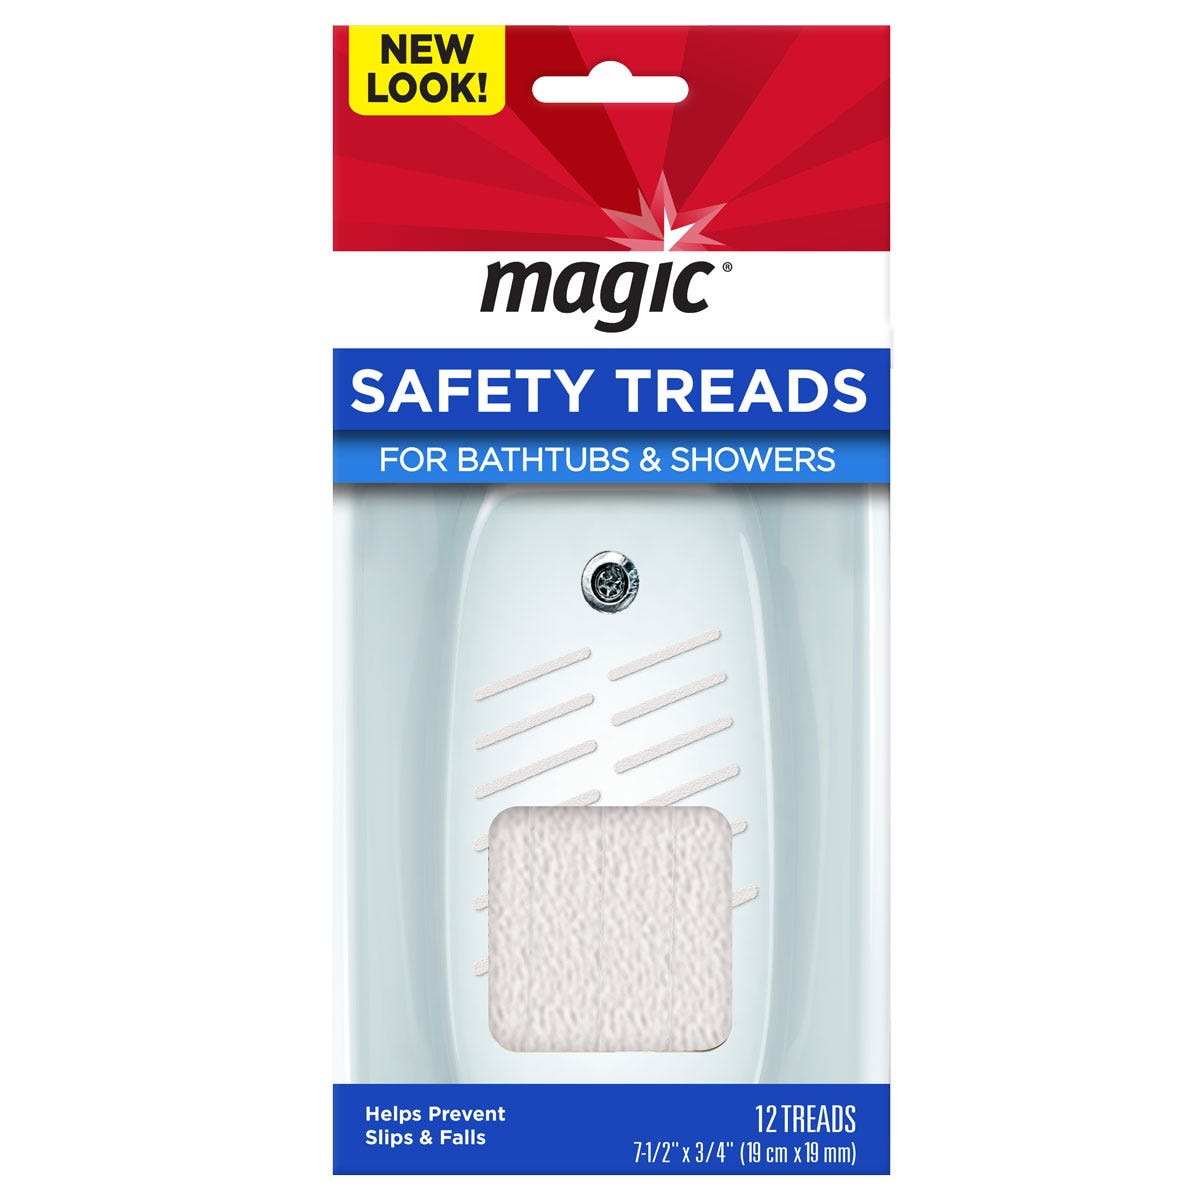 https://googone.com/media/catalog/product/m/a/magic-shower-safety-treads_front.jpg